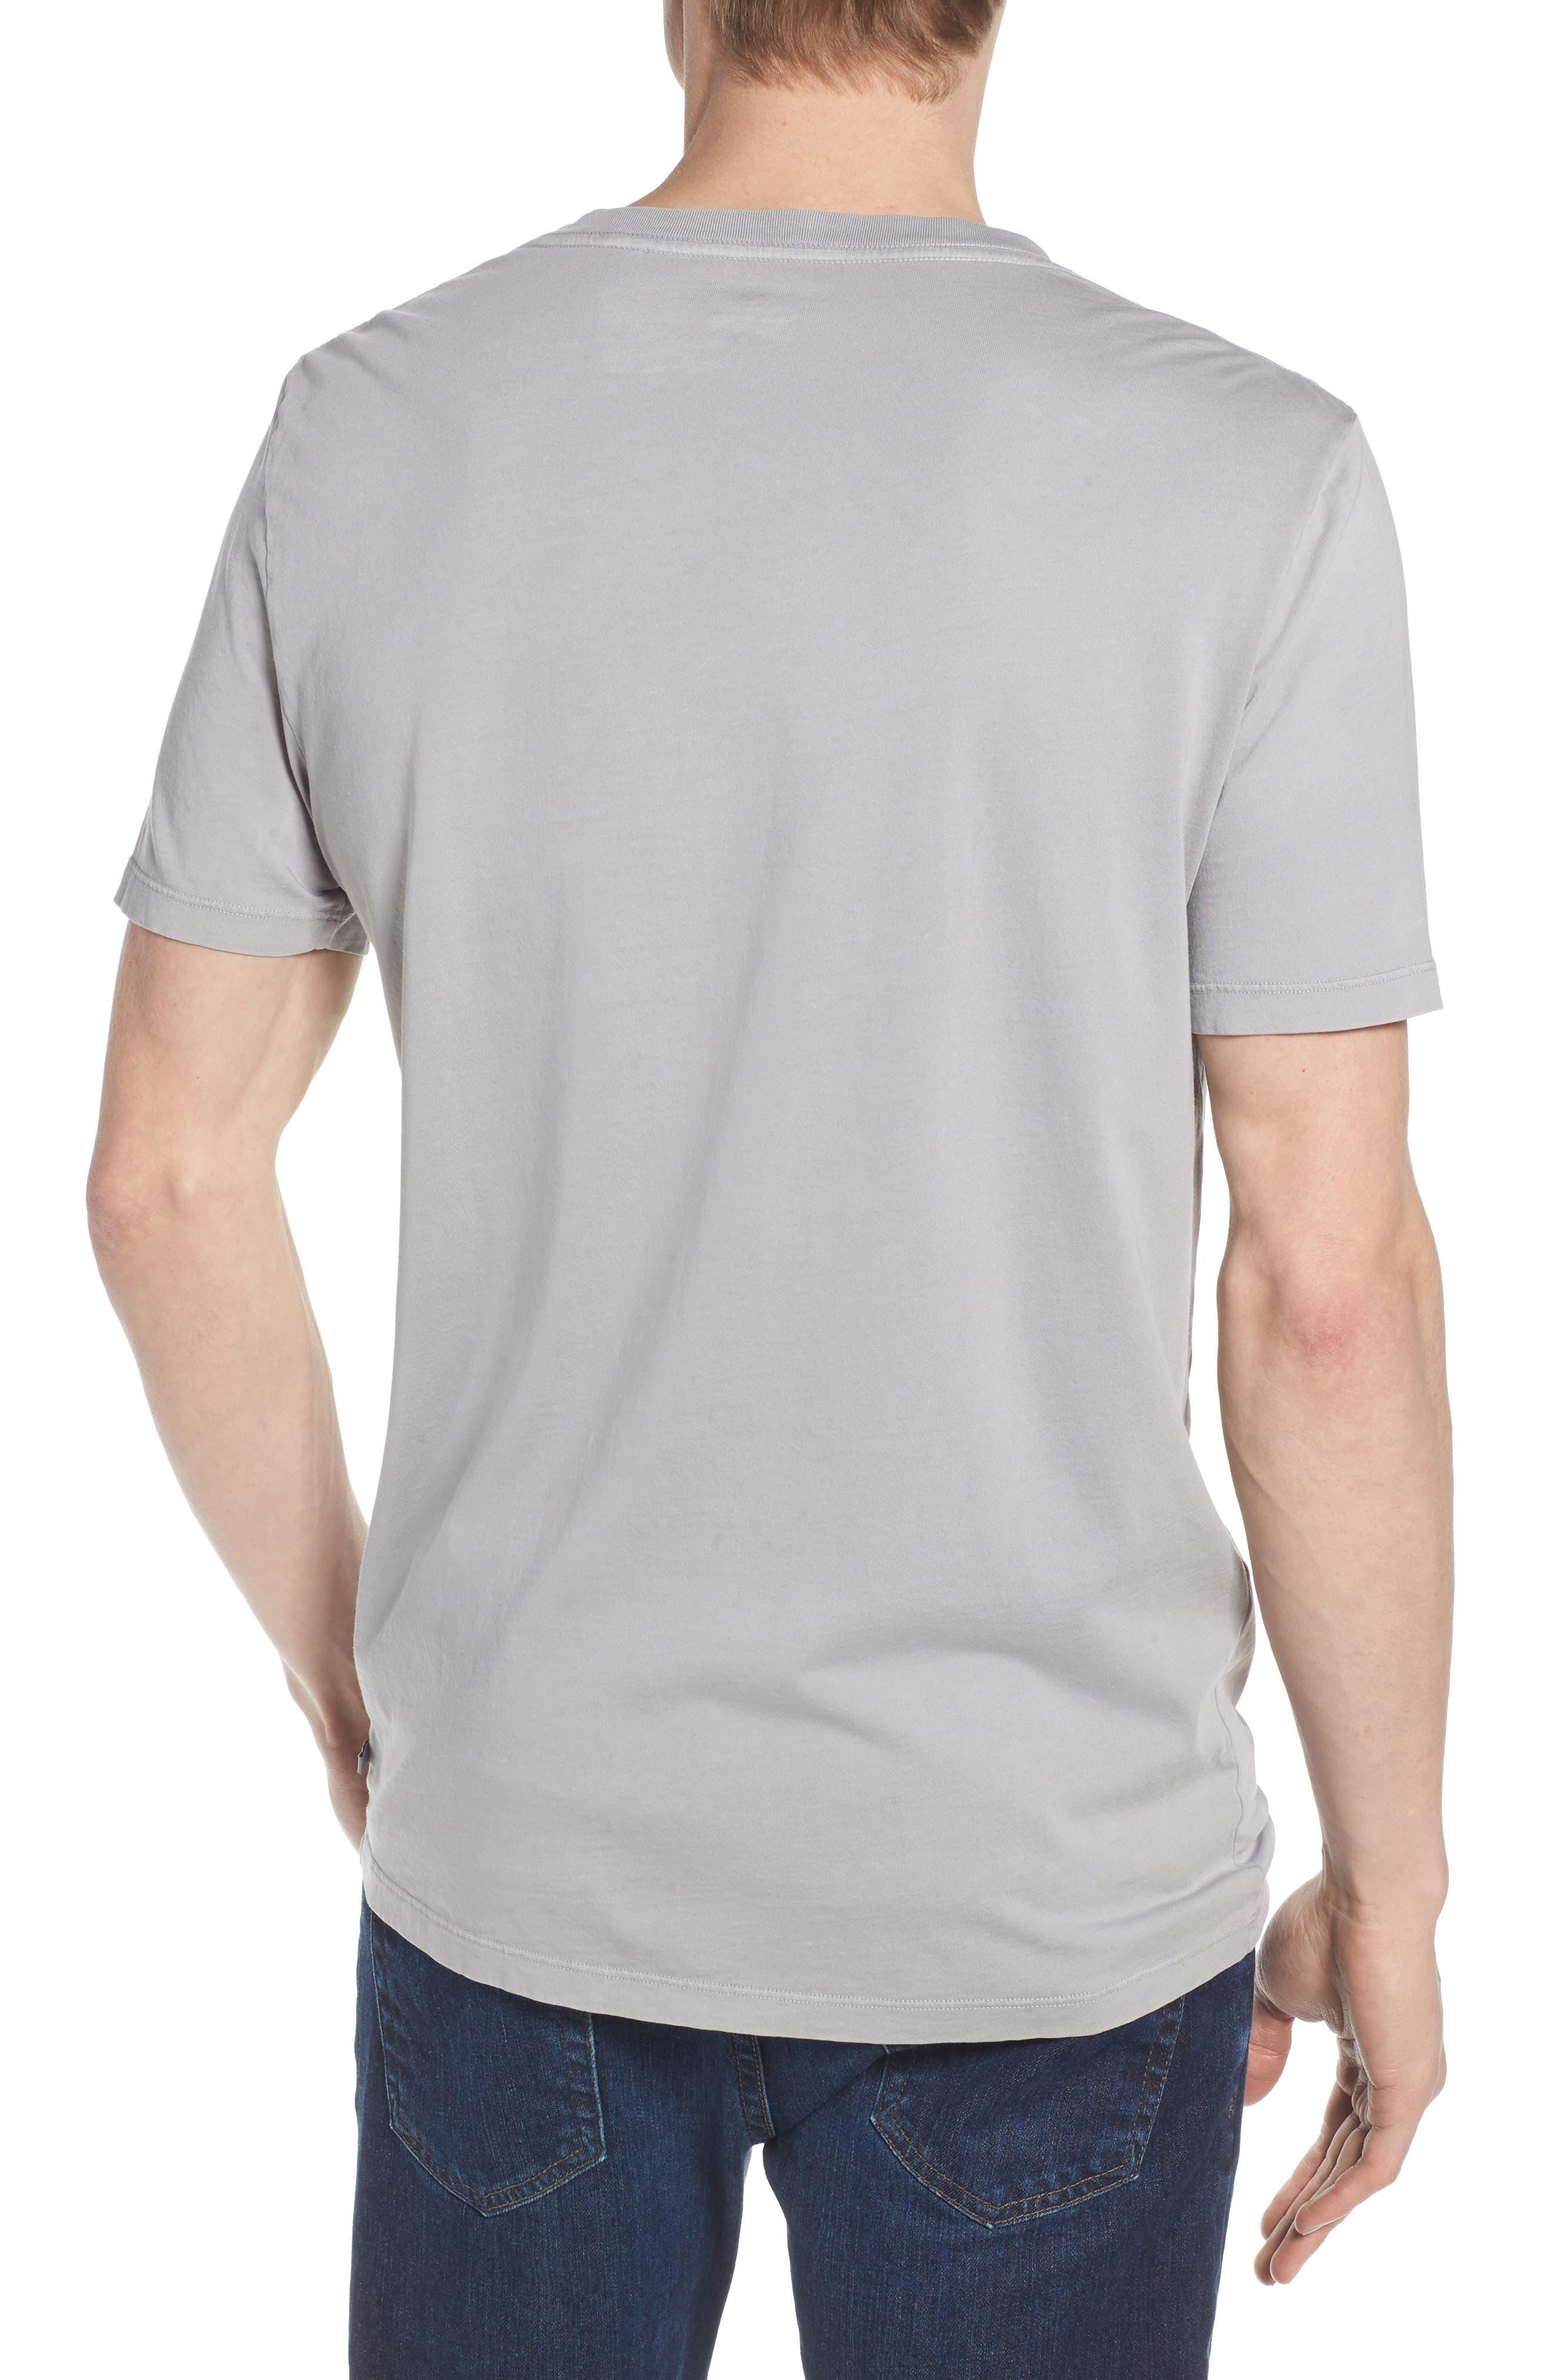 Anders Slim Fit Pocket T-Shirt,                             Alternate thumbnail 2, color,                             SUN FADED PEBBLE BEACH